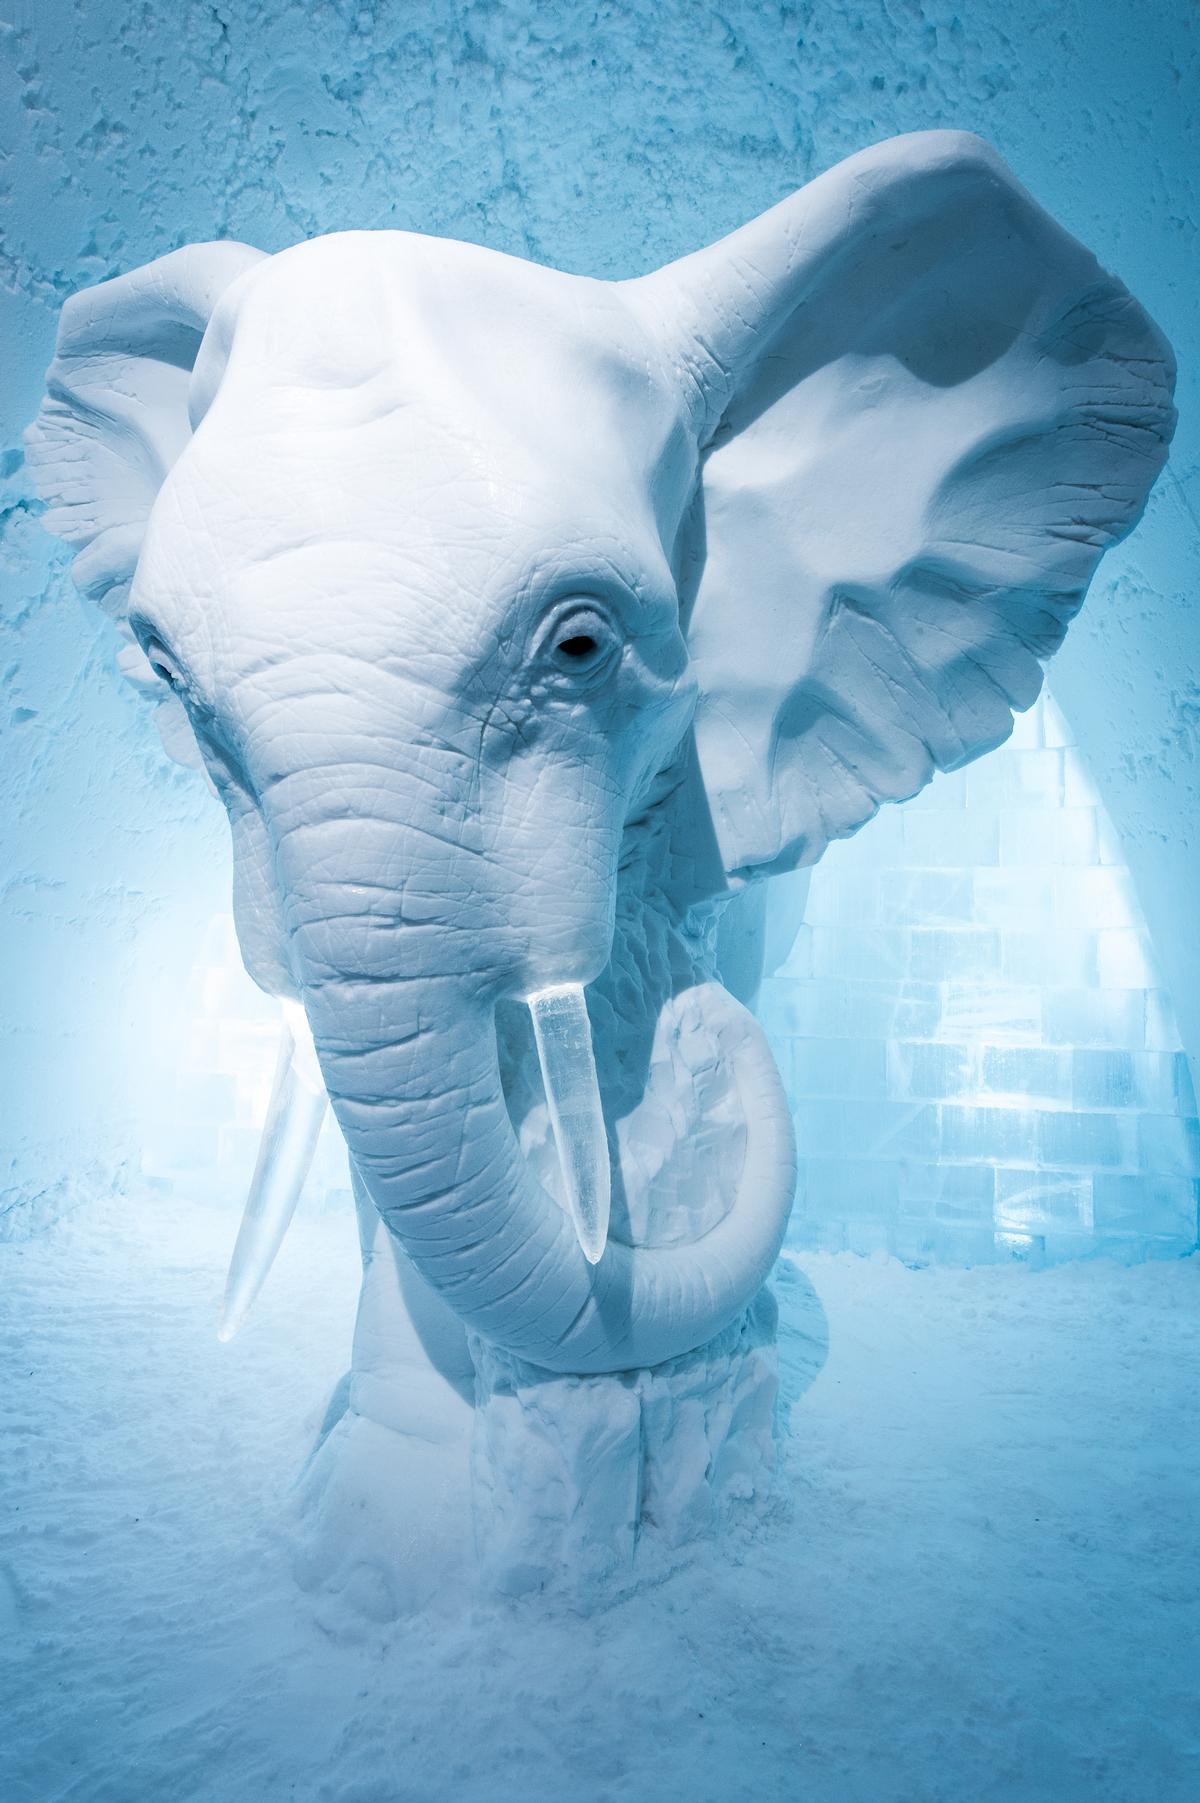 Elephant in the Room by AnnaSofia Mååg / Asaf Kliger